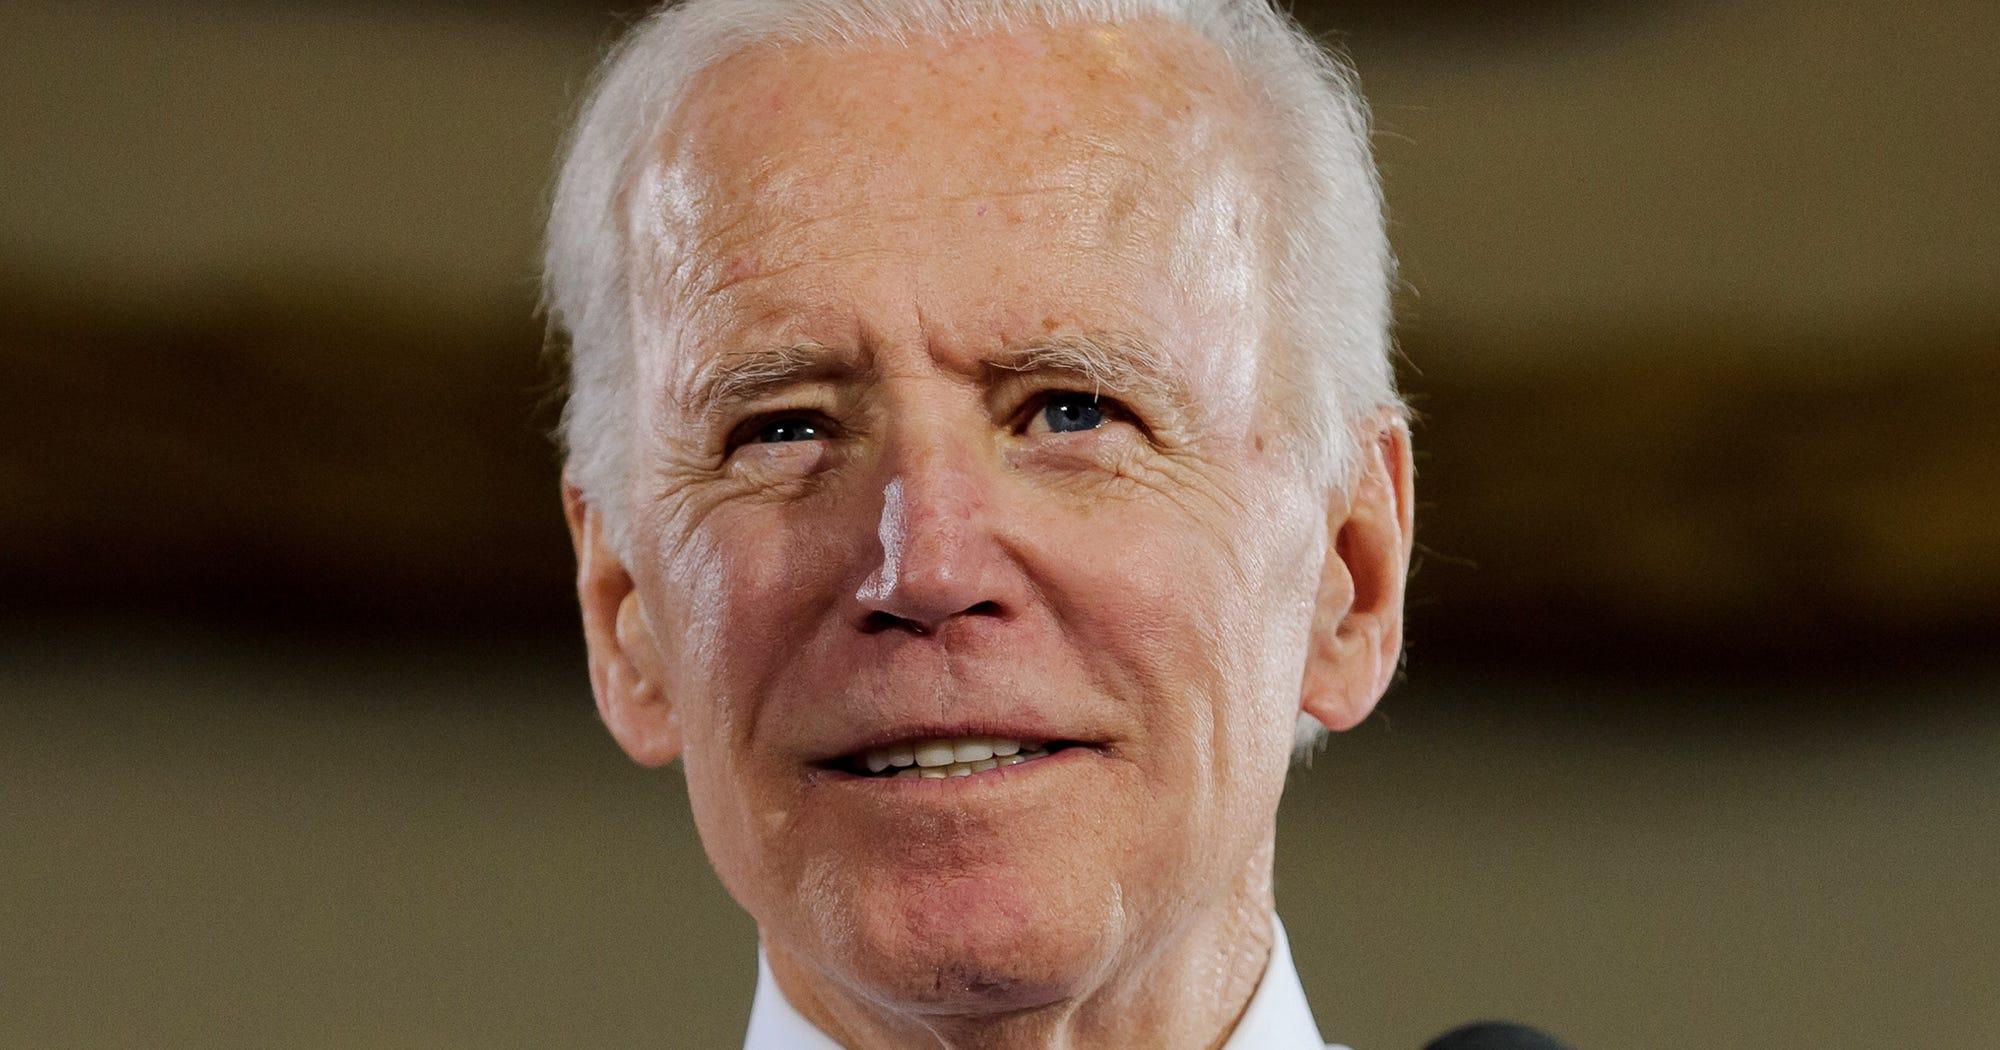 President Trump Joe Biden Beat The Hell Out Fight Tweet